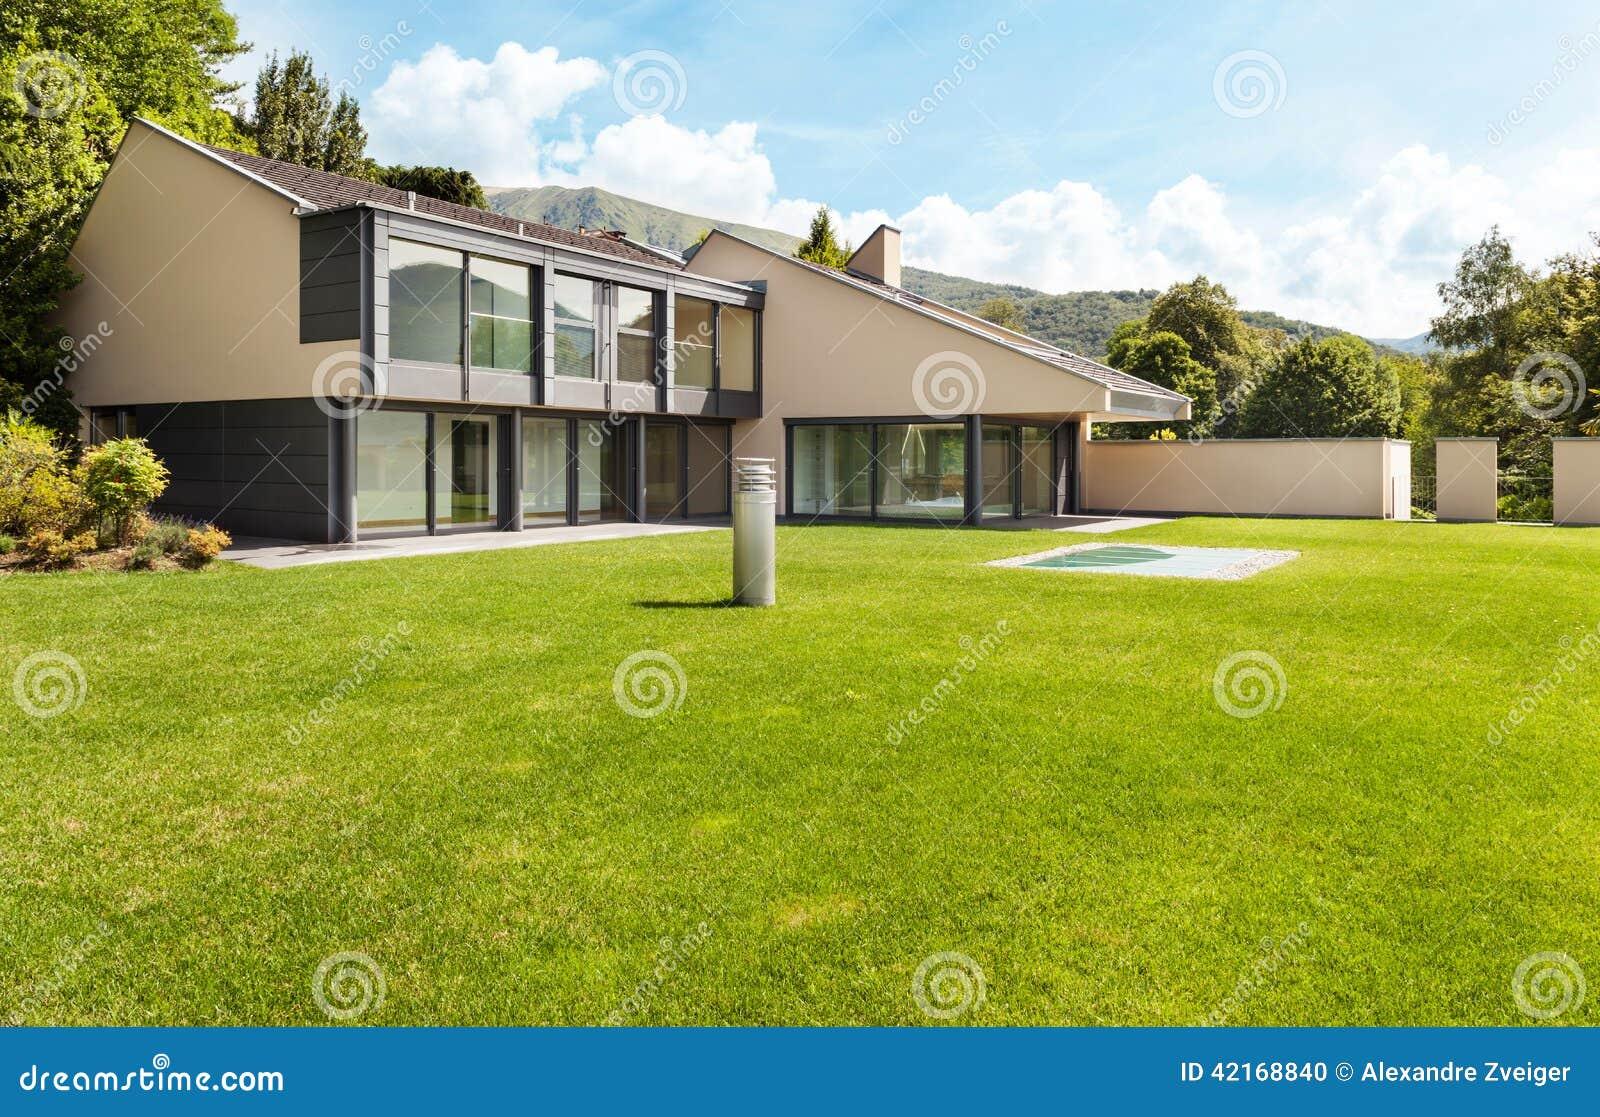 Beautiful villa, outdoor